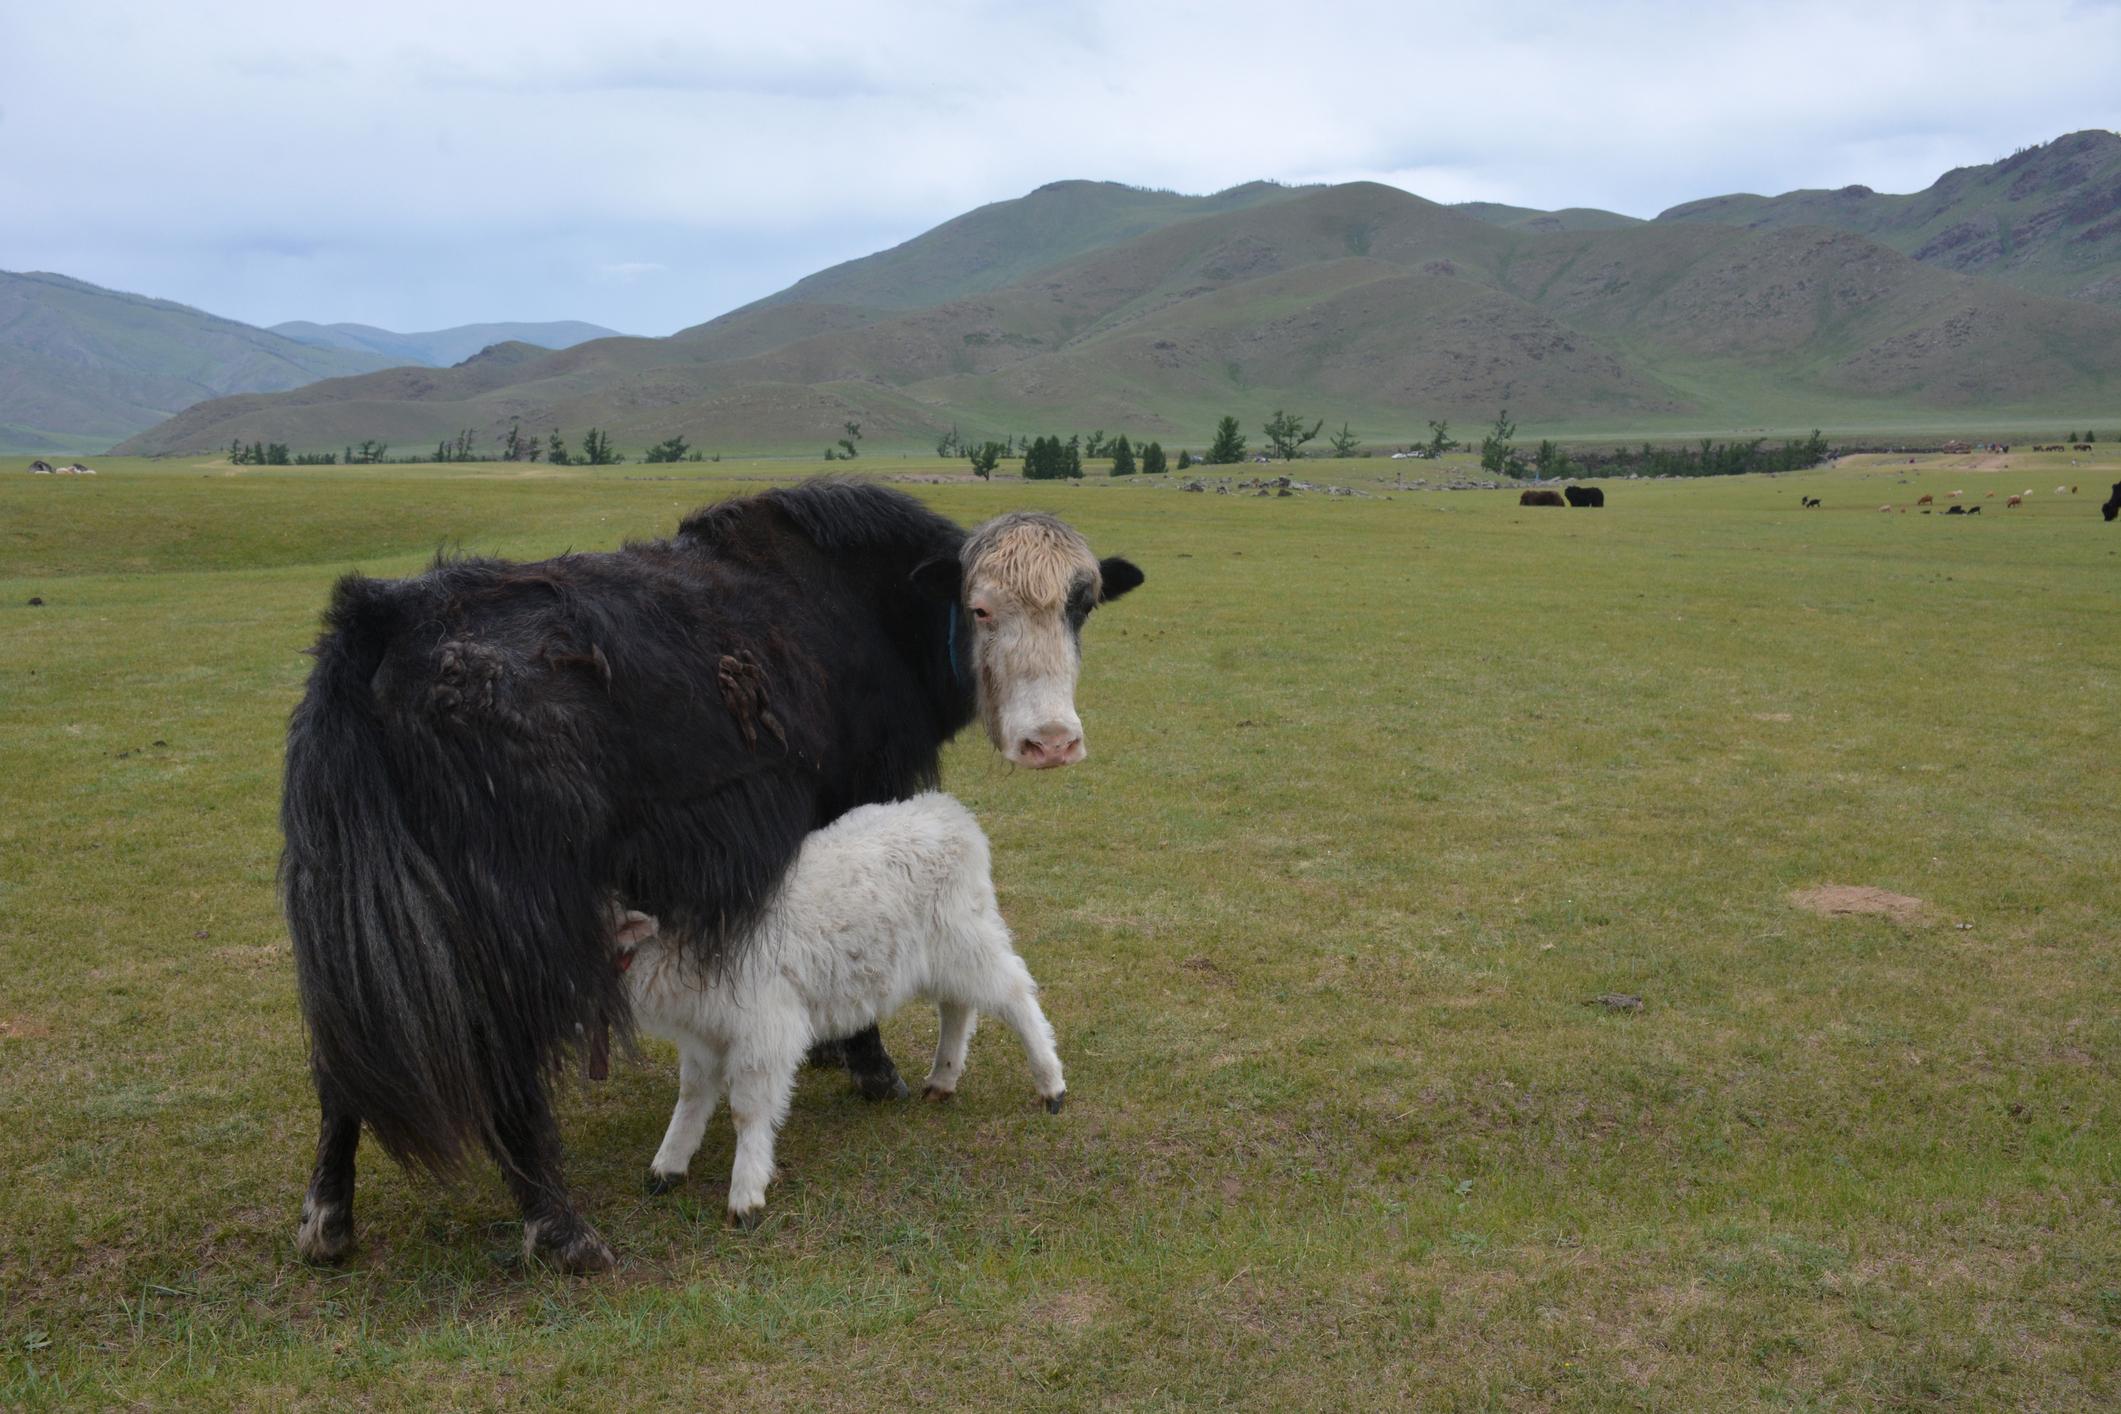 Female yak with newborn calf. ©Getty